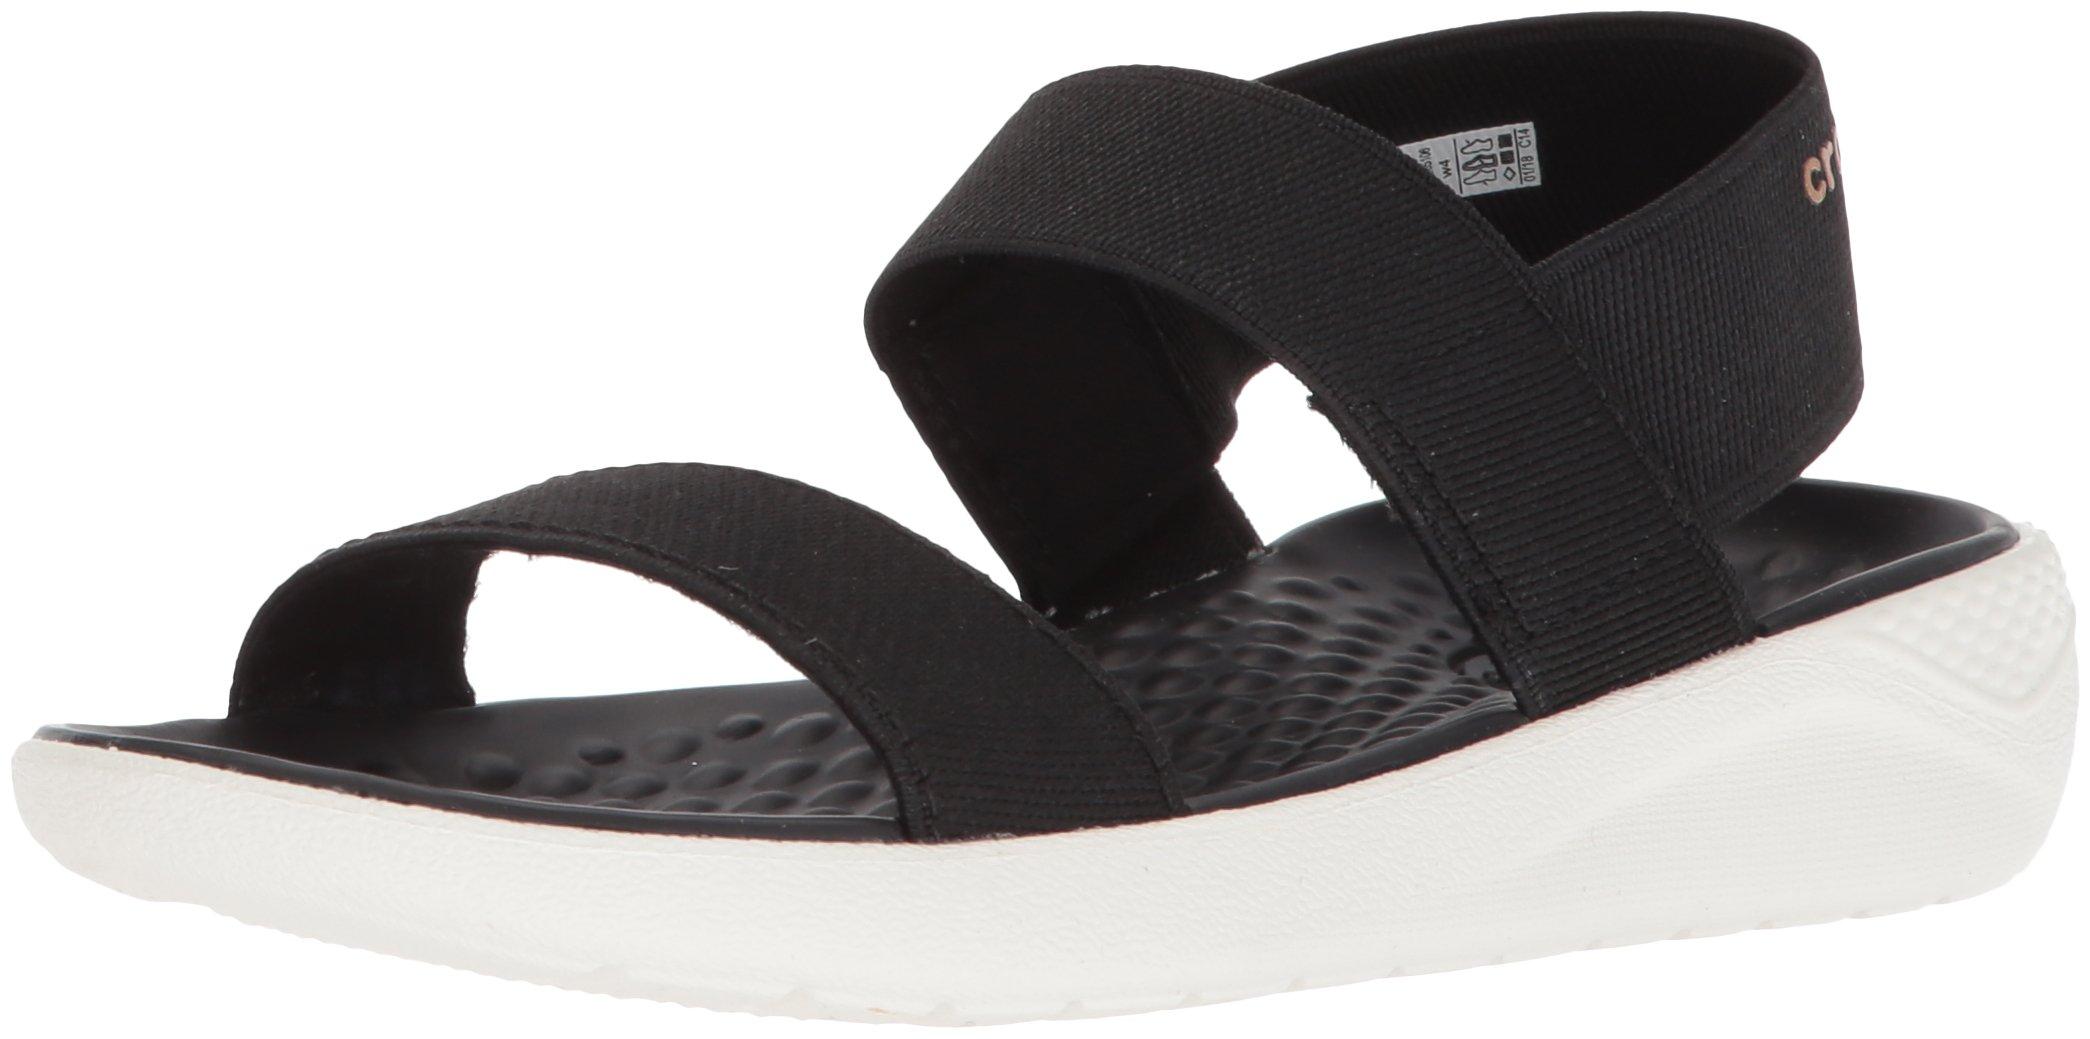 Crocs Womens LiteRide Sandal black